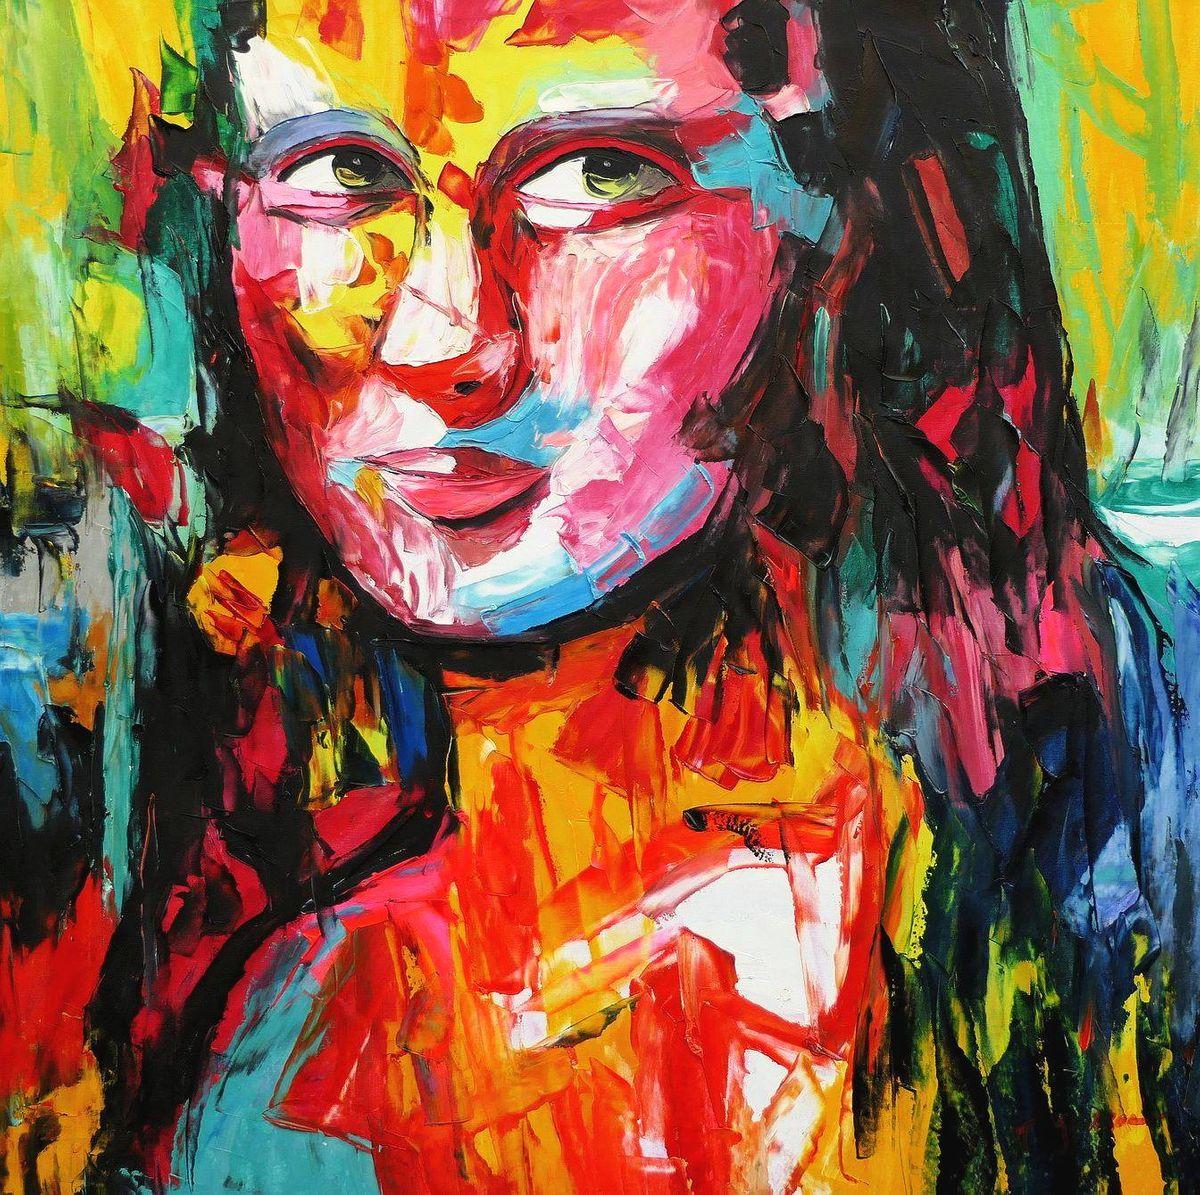 Modern Art - Mona Lisa g97133 80x80cm exquisites Ölbild